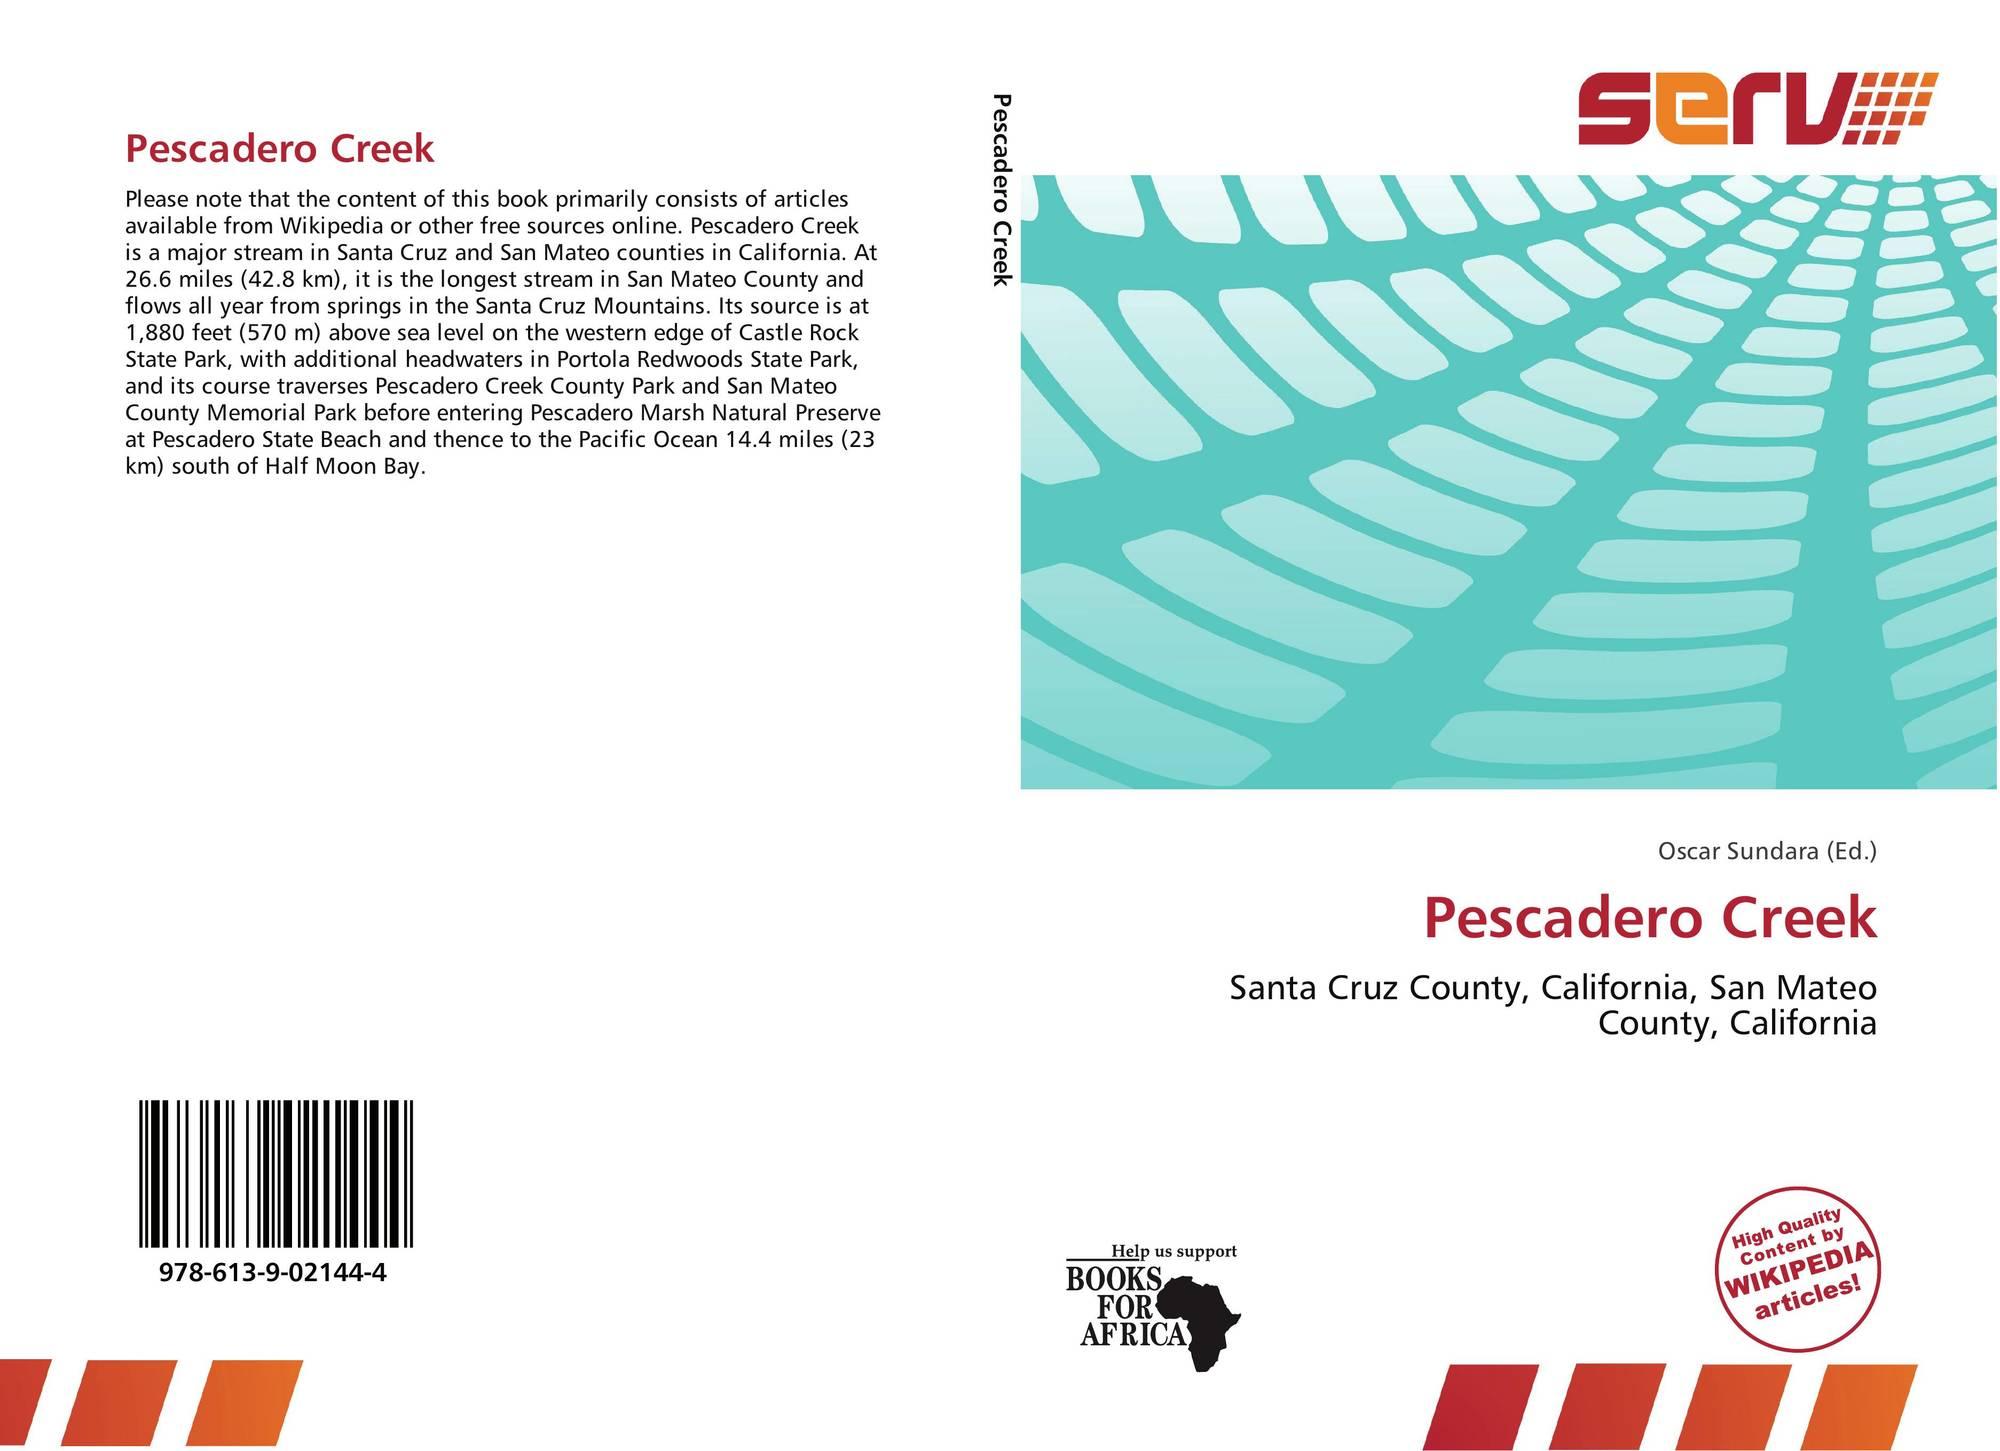 California san mateo county pescadero - Bookcover Of Pescadero Creek Omni Badge Pescadero Creek Santa Cruz County California San Mateo